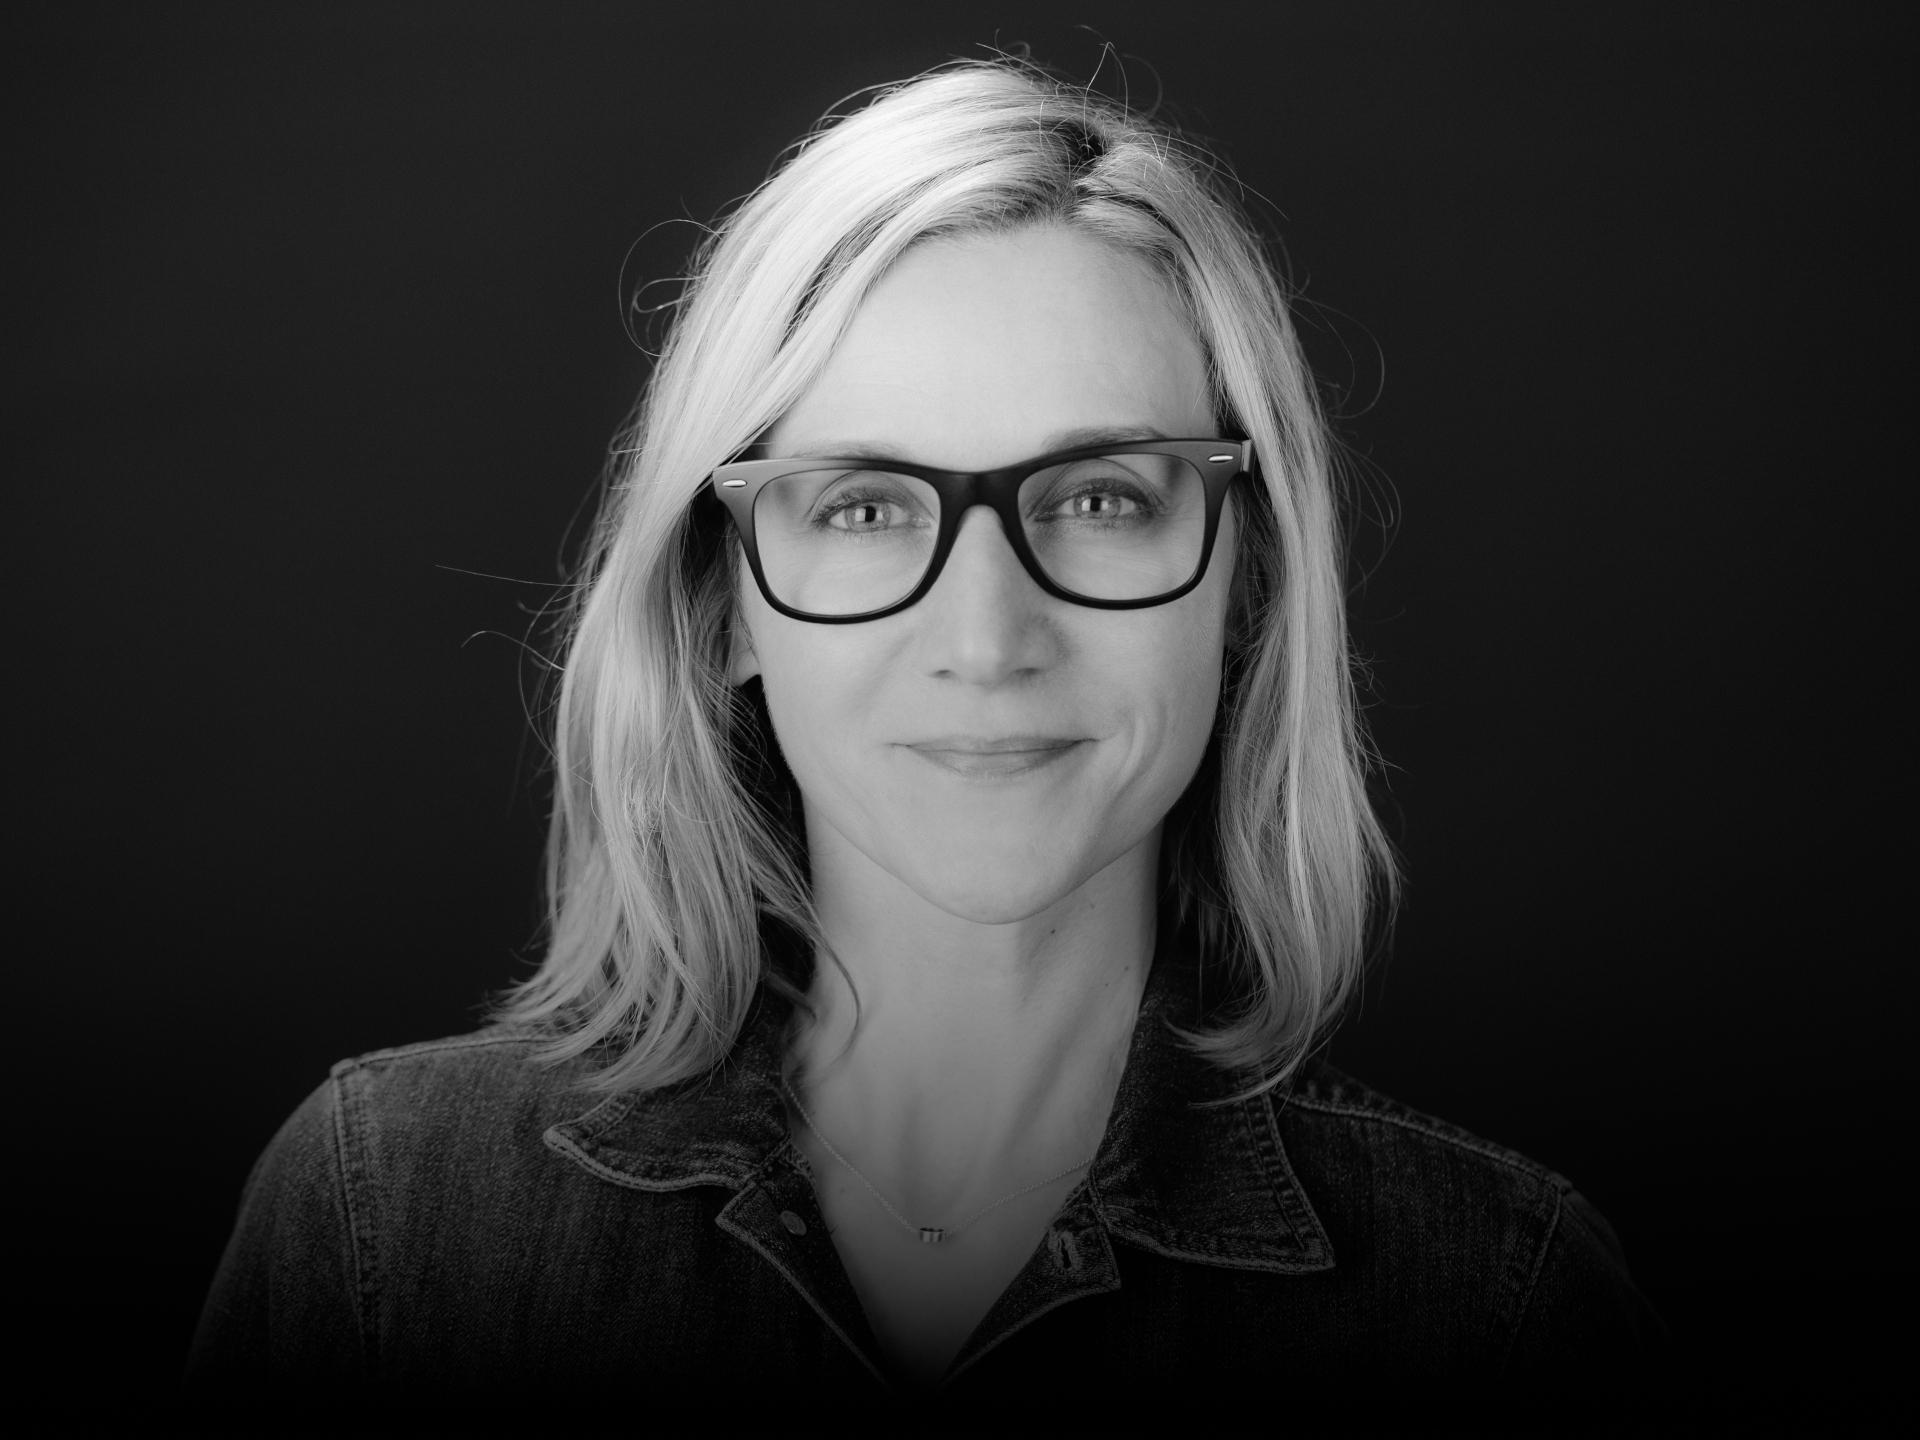 Image of Juliana Cobb